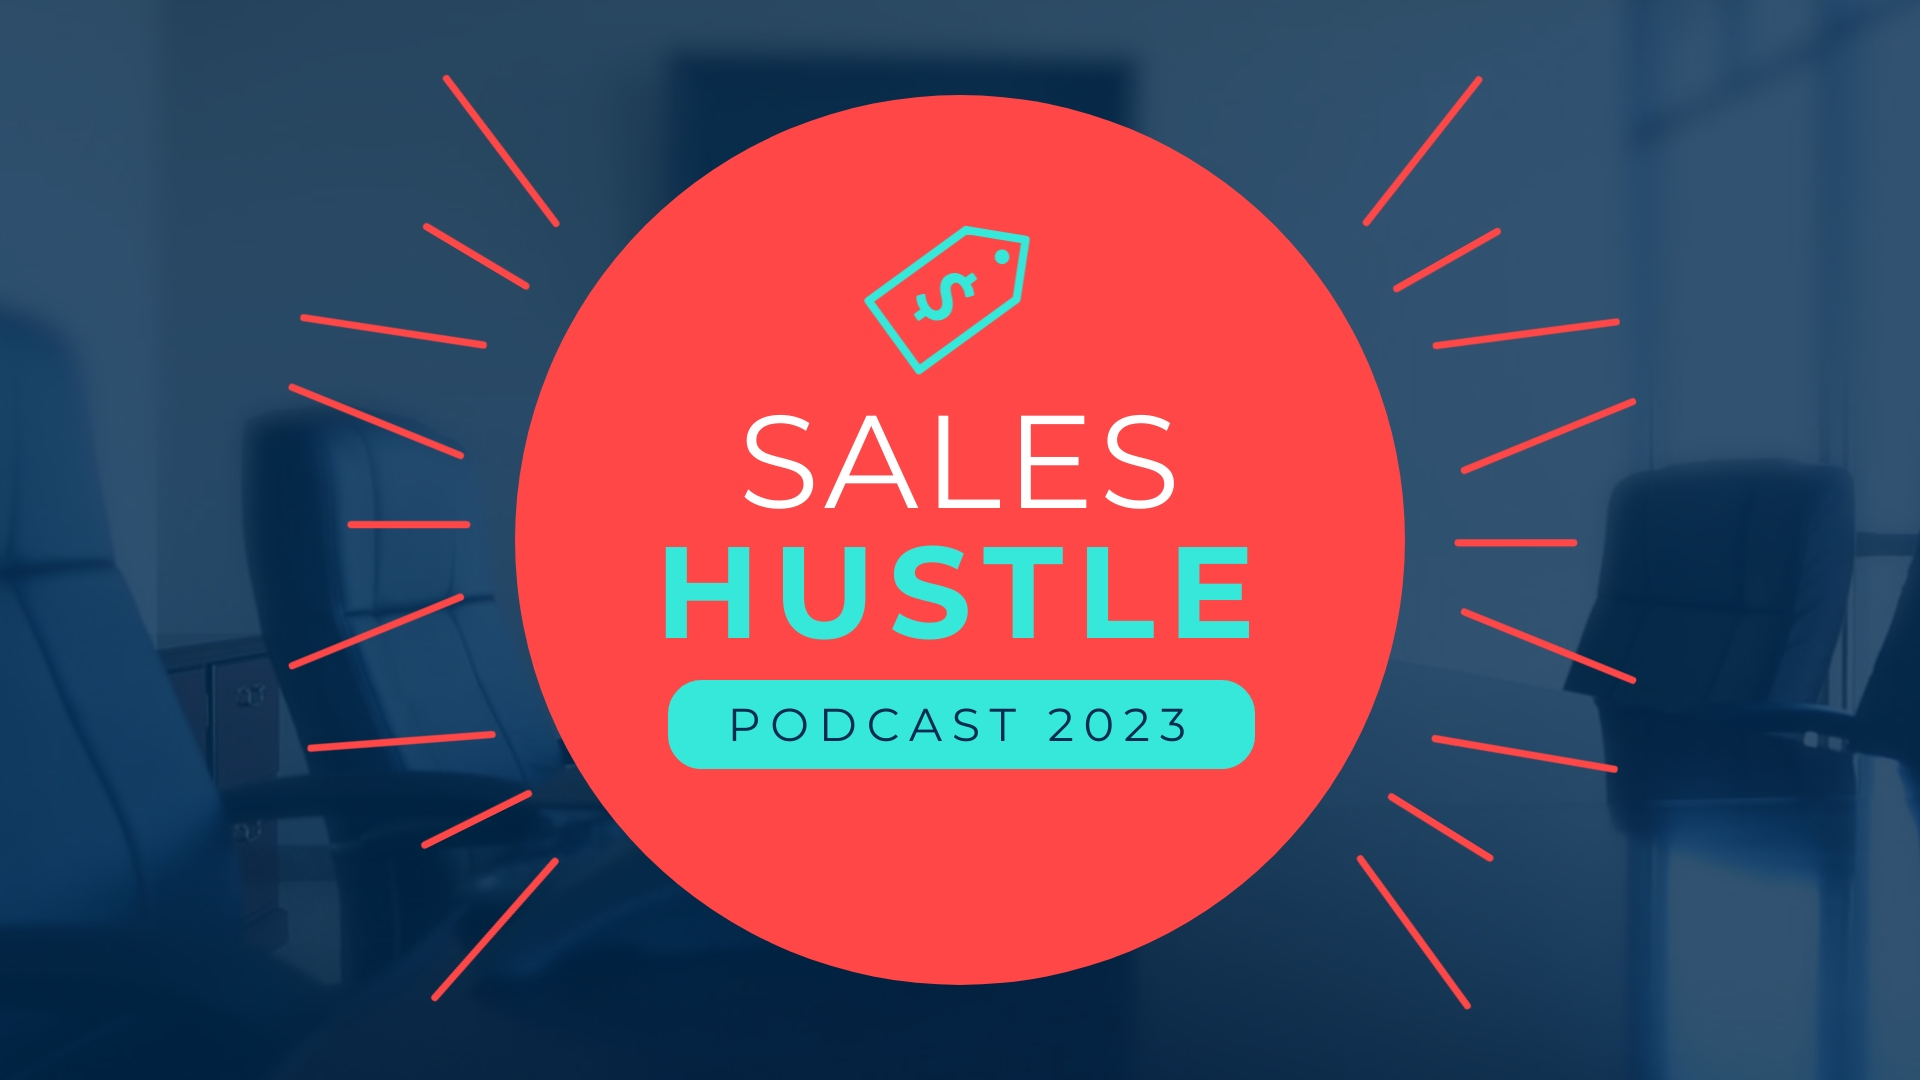 Podcast - Promo Ad Template